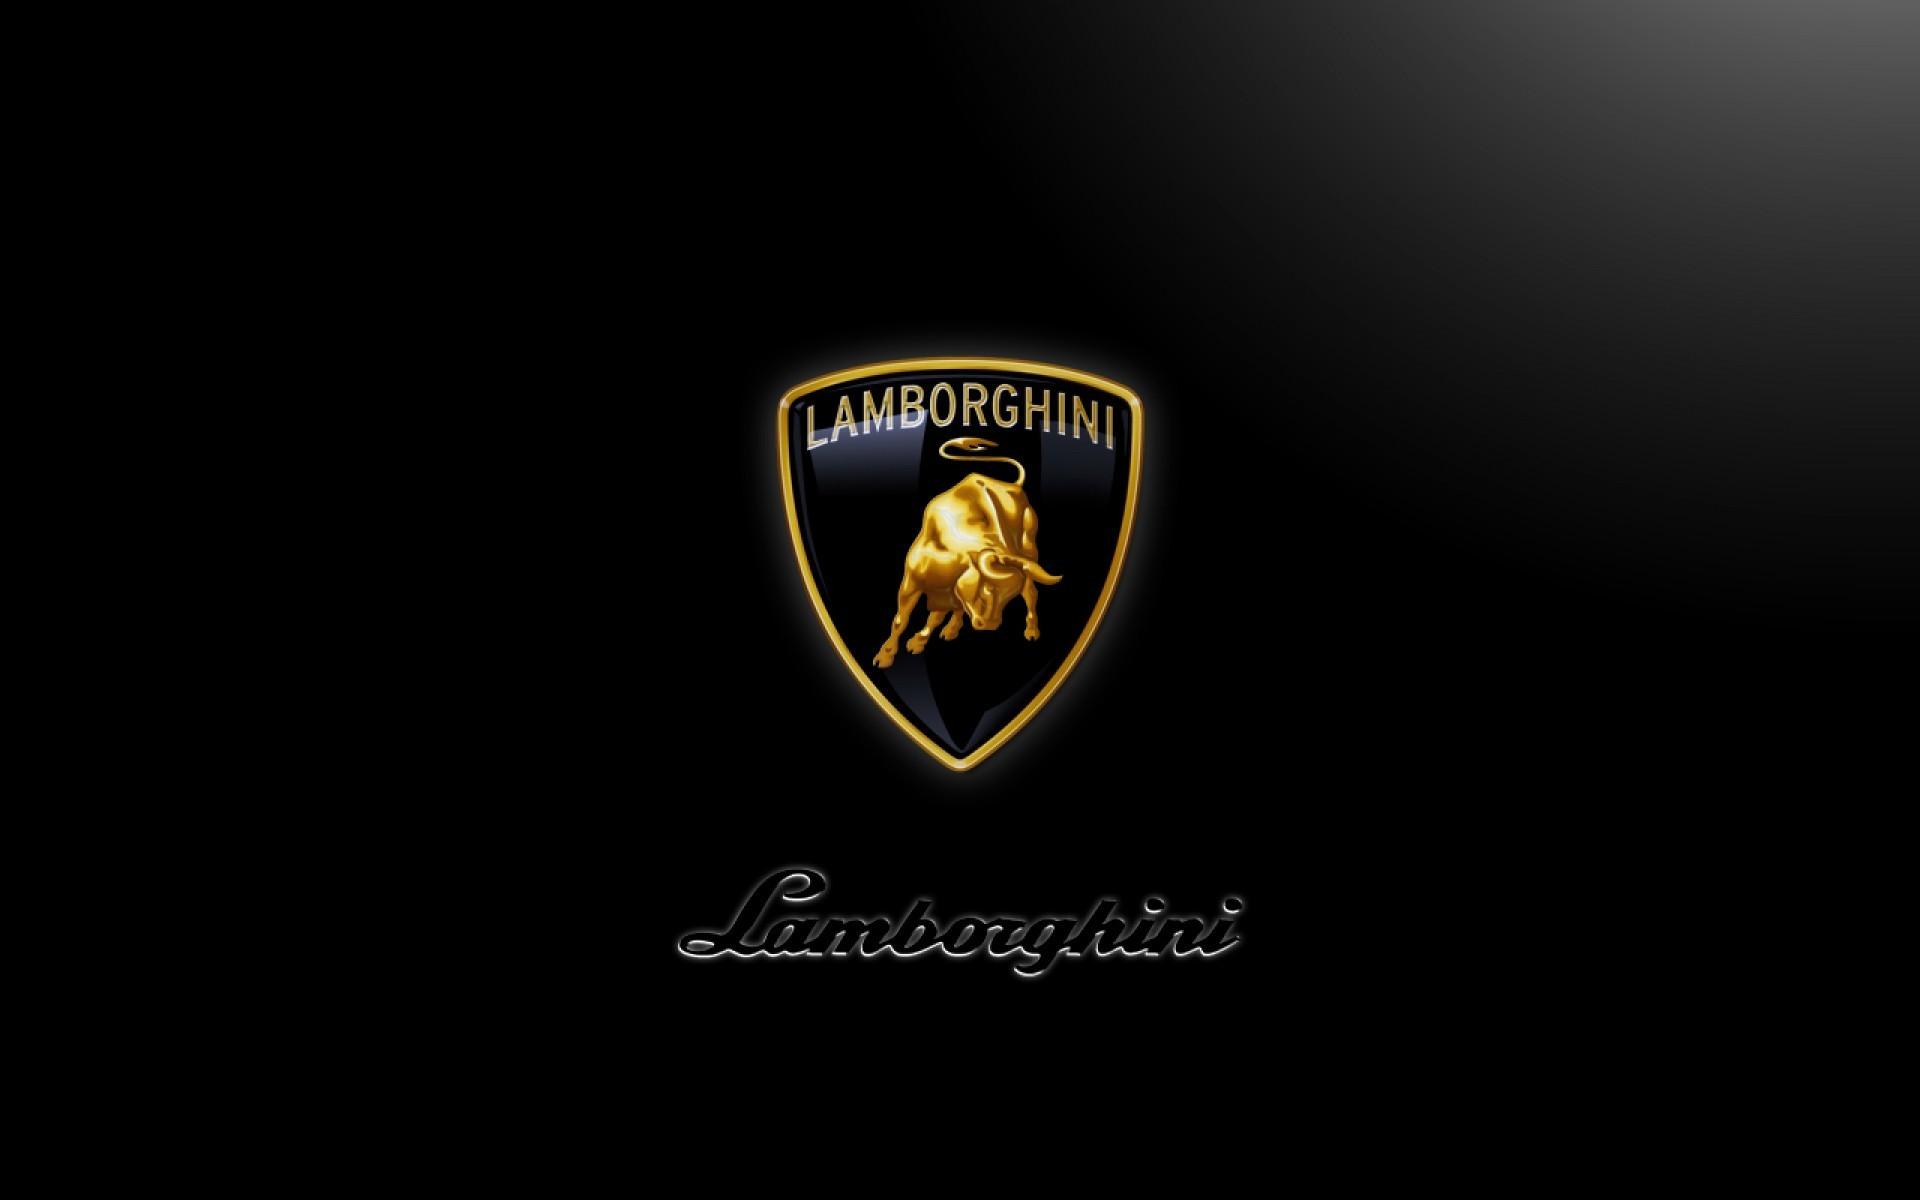 … Lamborghini Logo Wallpaper …